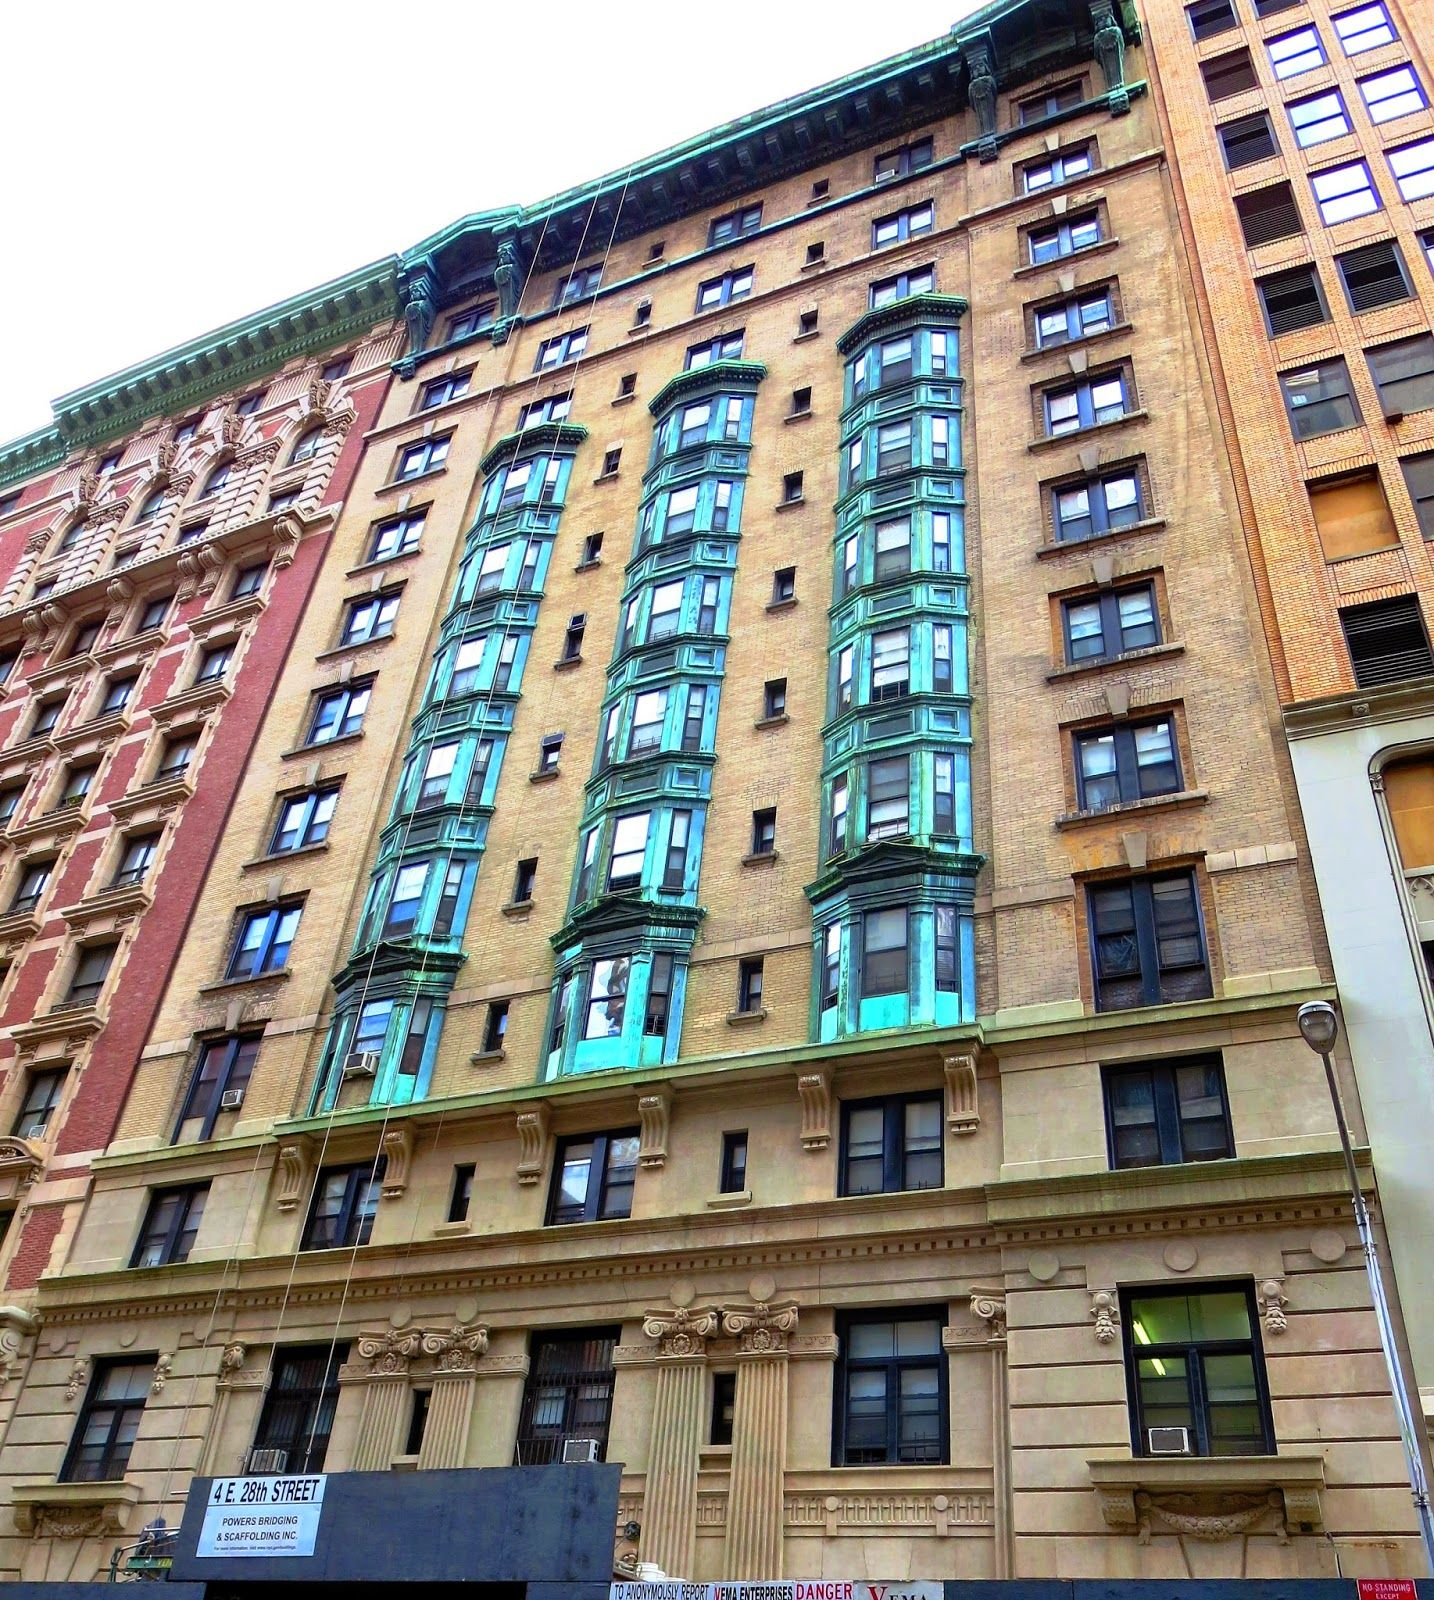 New York City Boroughs Manhattan Hotel Latham 4 East 28th Street Designed